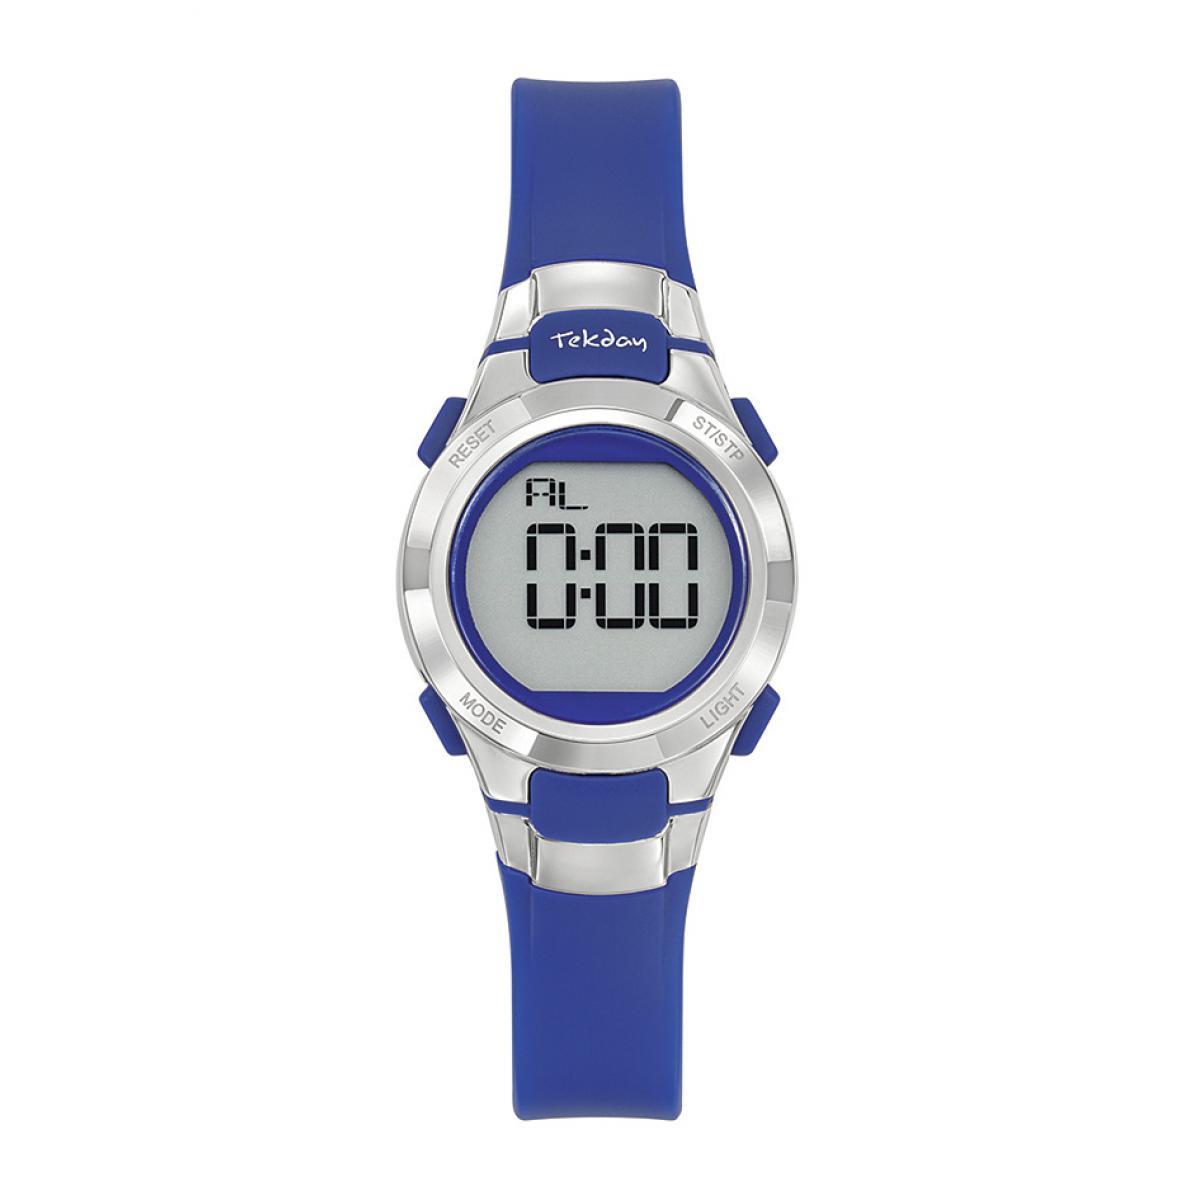 Montre 654668 - Bracelet Silicone Bleu Boitier Silicone Bleu - Tekday - Modalova